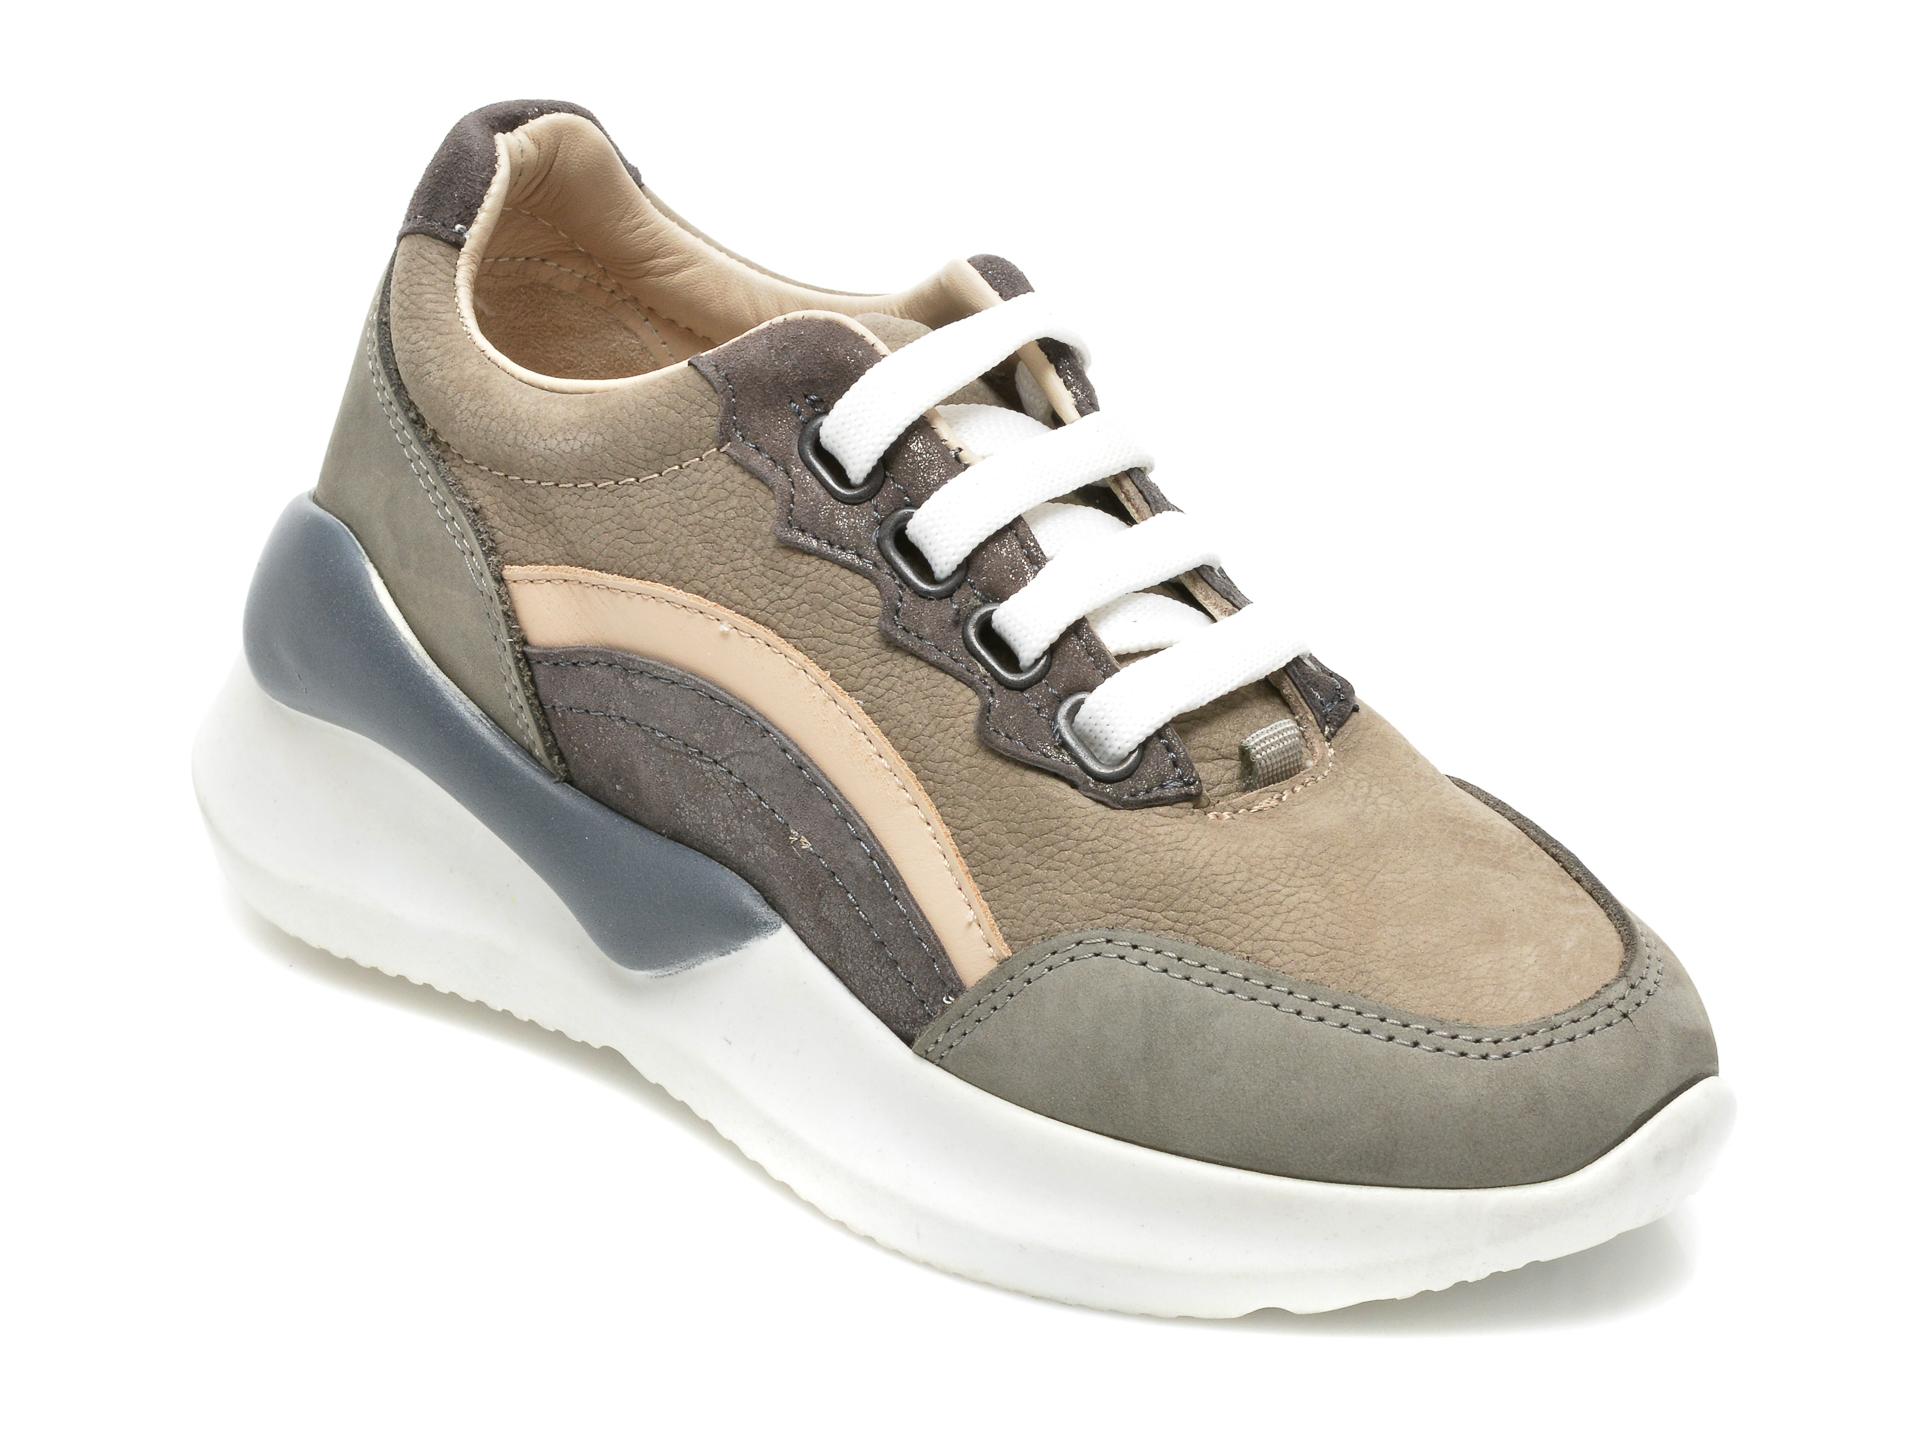 Pantofi Sport Donna Style Gri, 212, Din Nabuc